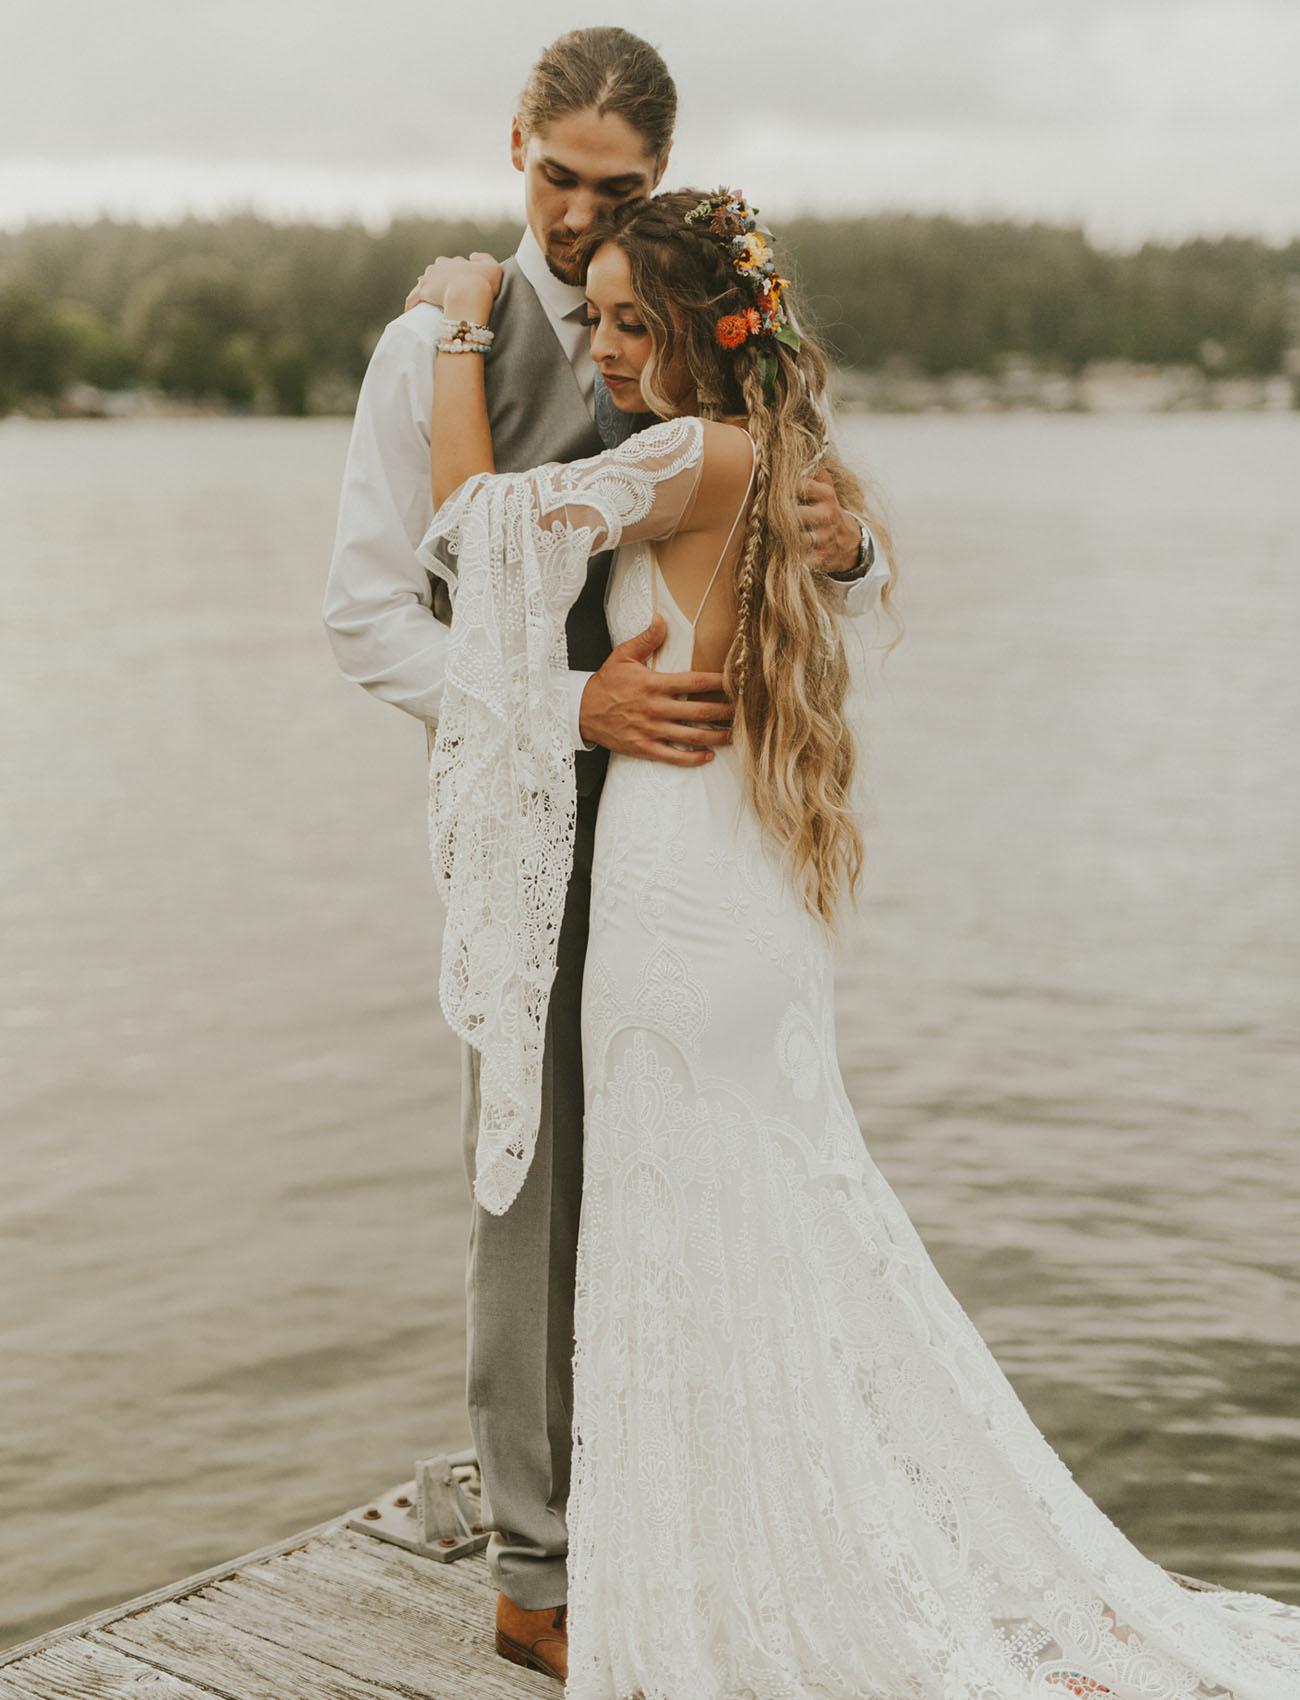 This boho wildflower wedding took place in Washington